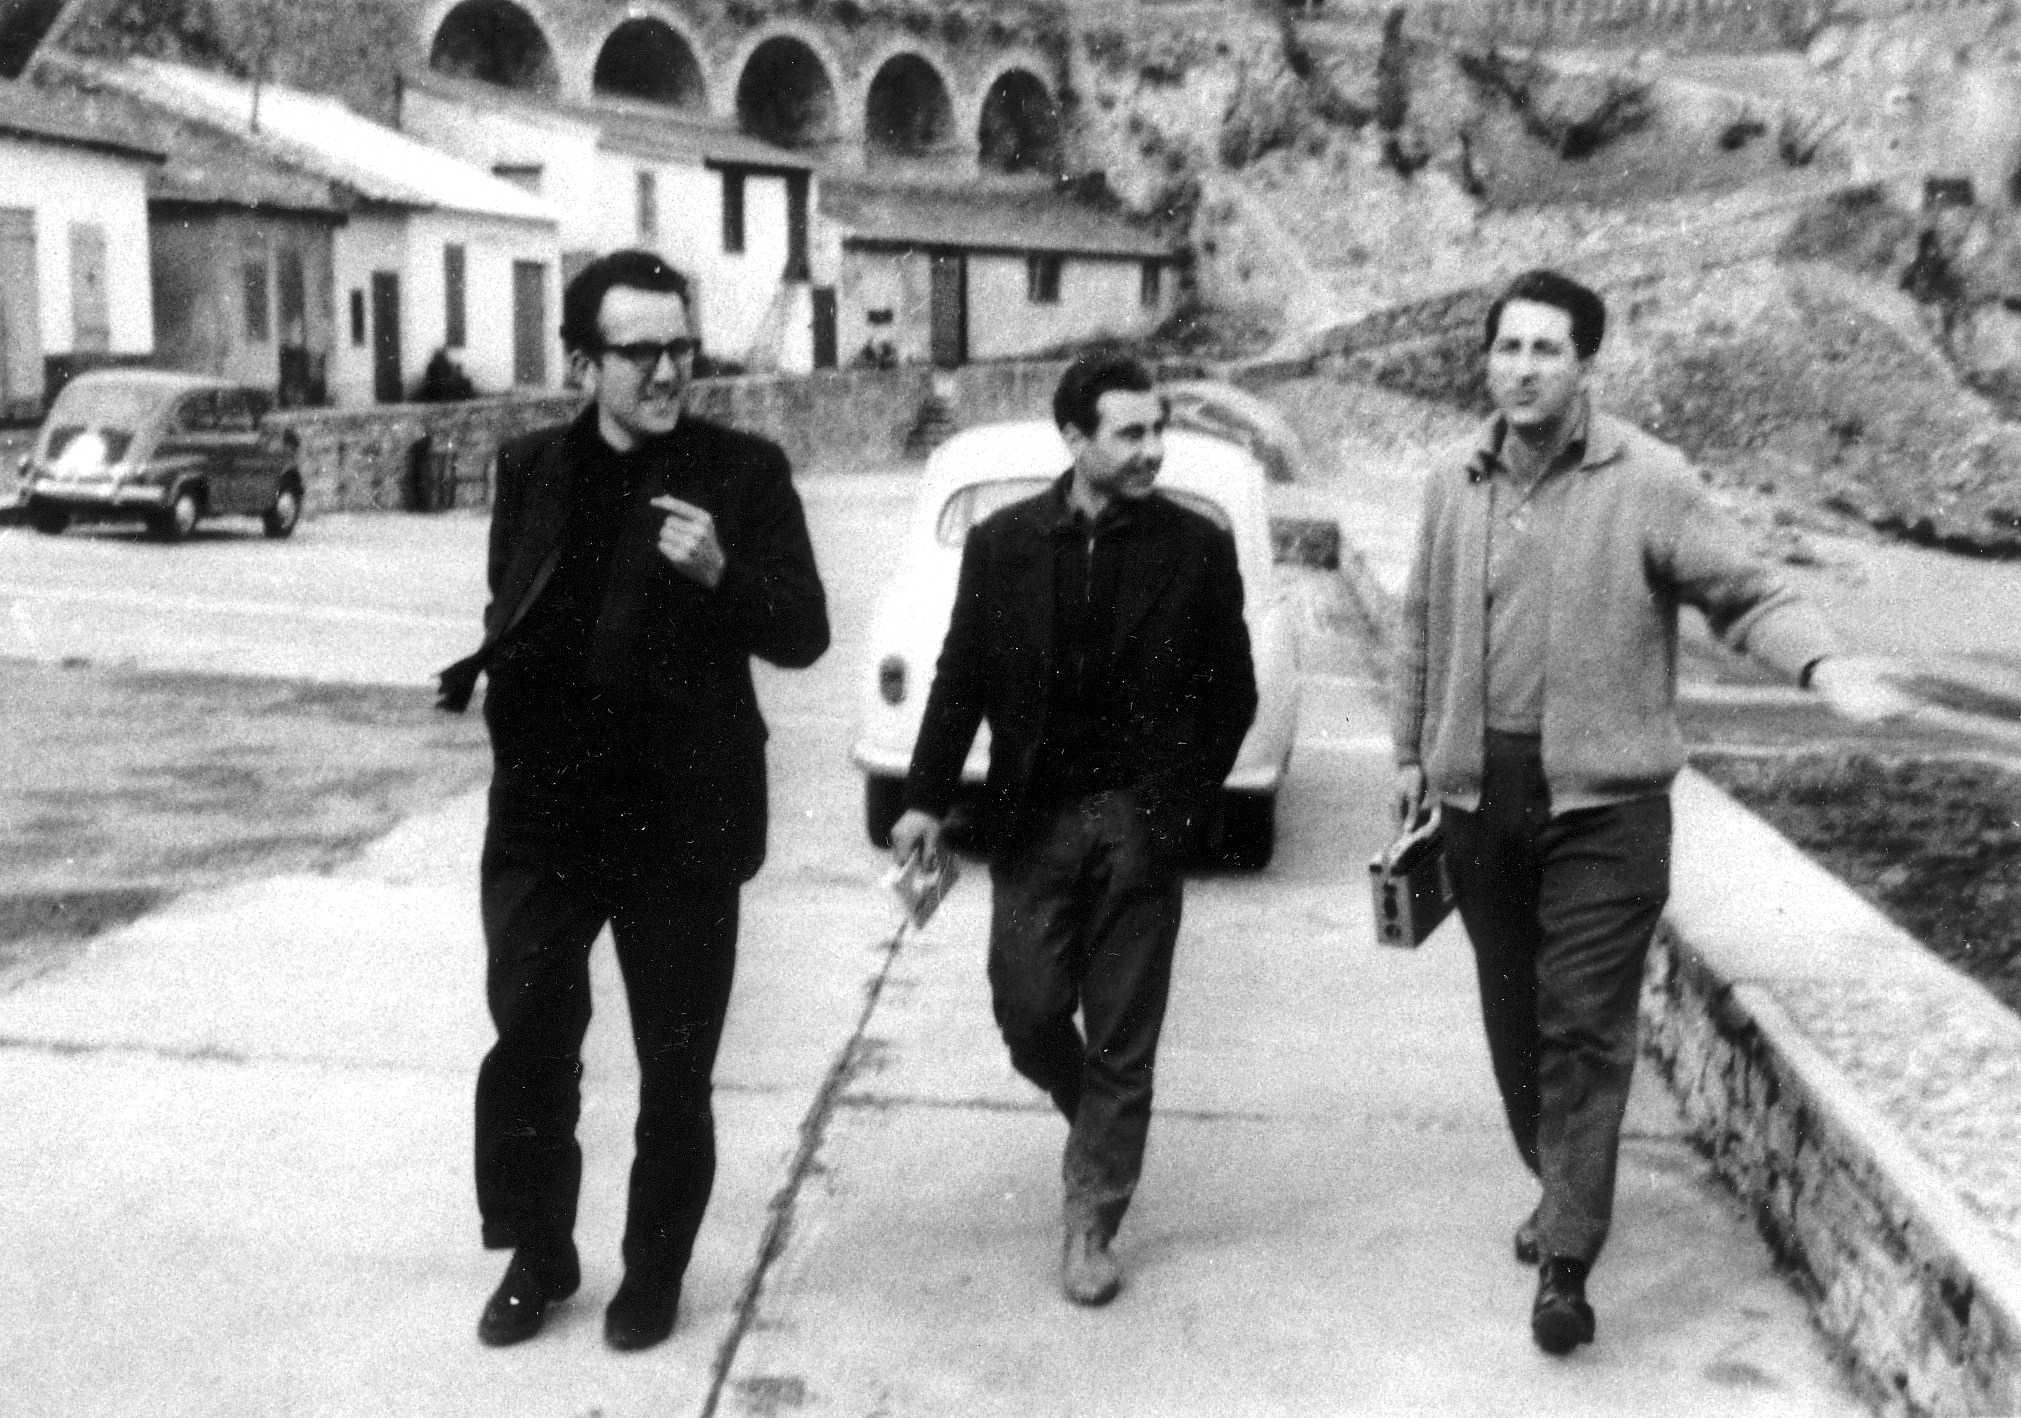 D'esquerra a dreta: Salvador Gurucharri Ochoa, Antonio Ros i Octavio Alberola Suriñach (Biarritz, 1962)